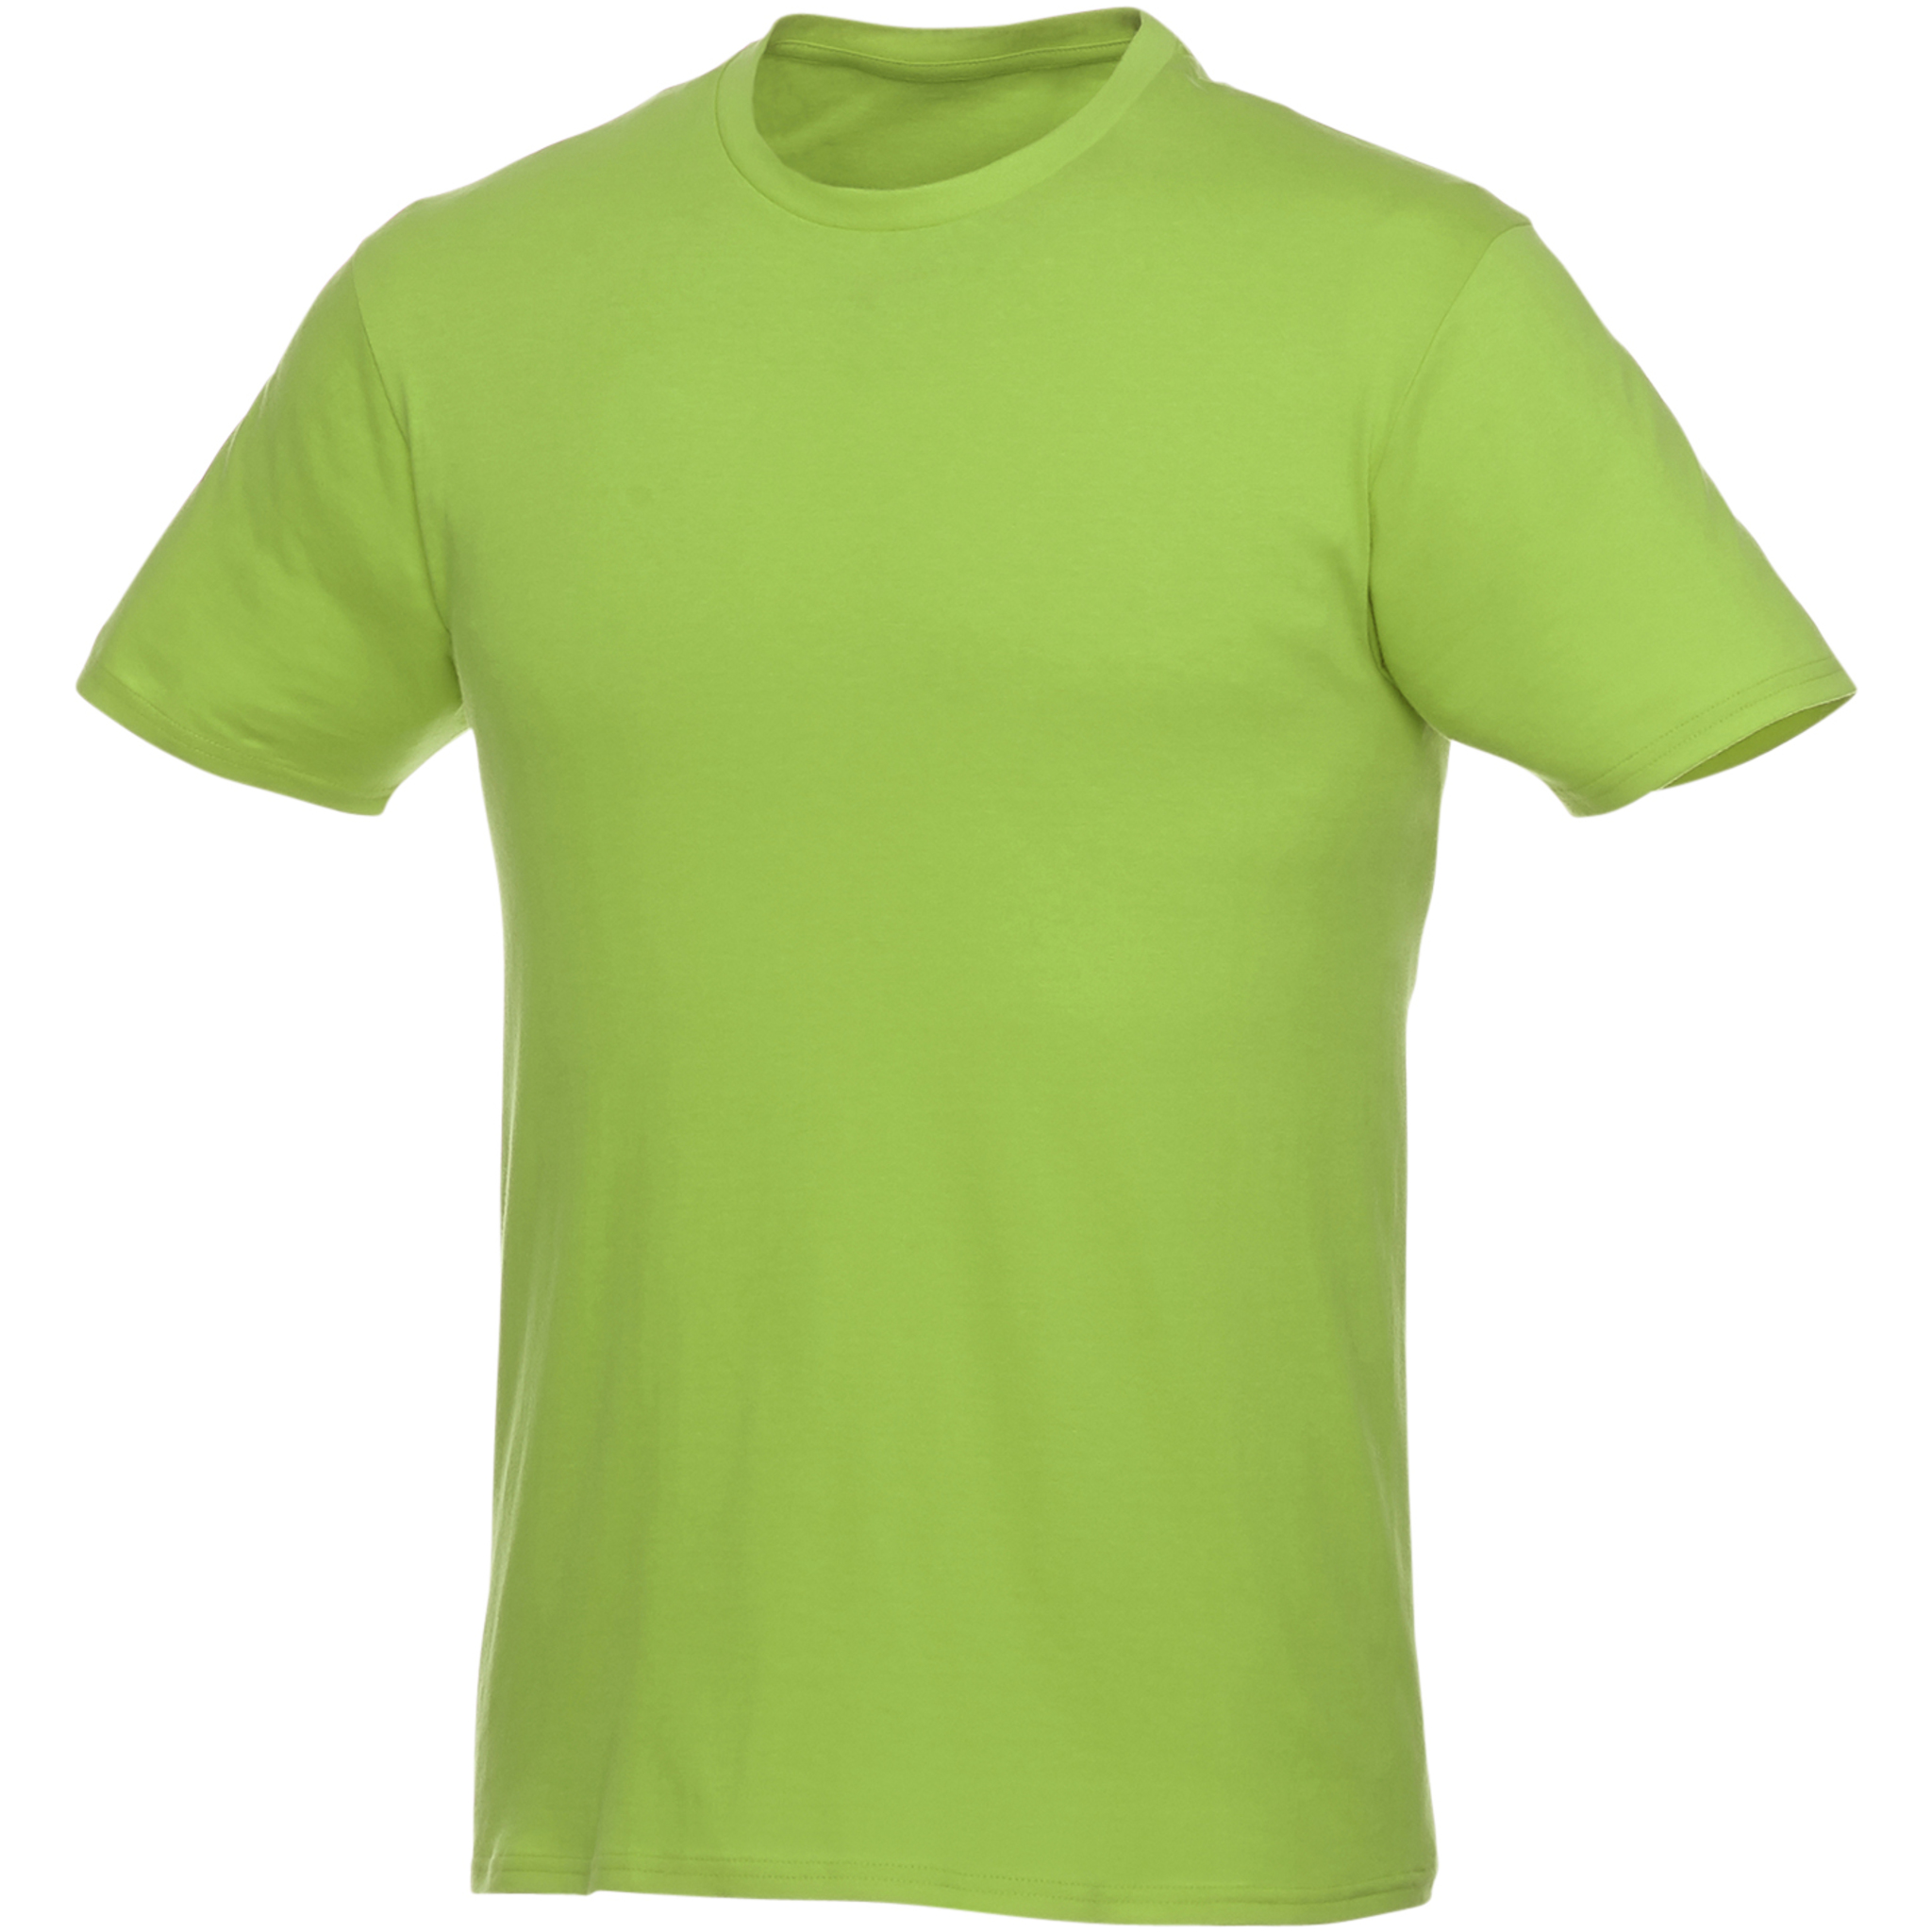 Elevate Unisex Heros Short Sleeve T-Shirt (L) (Apple Green)